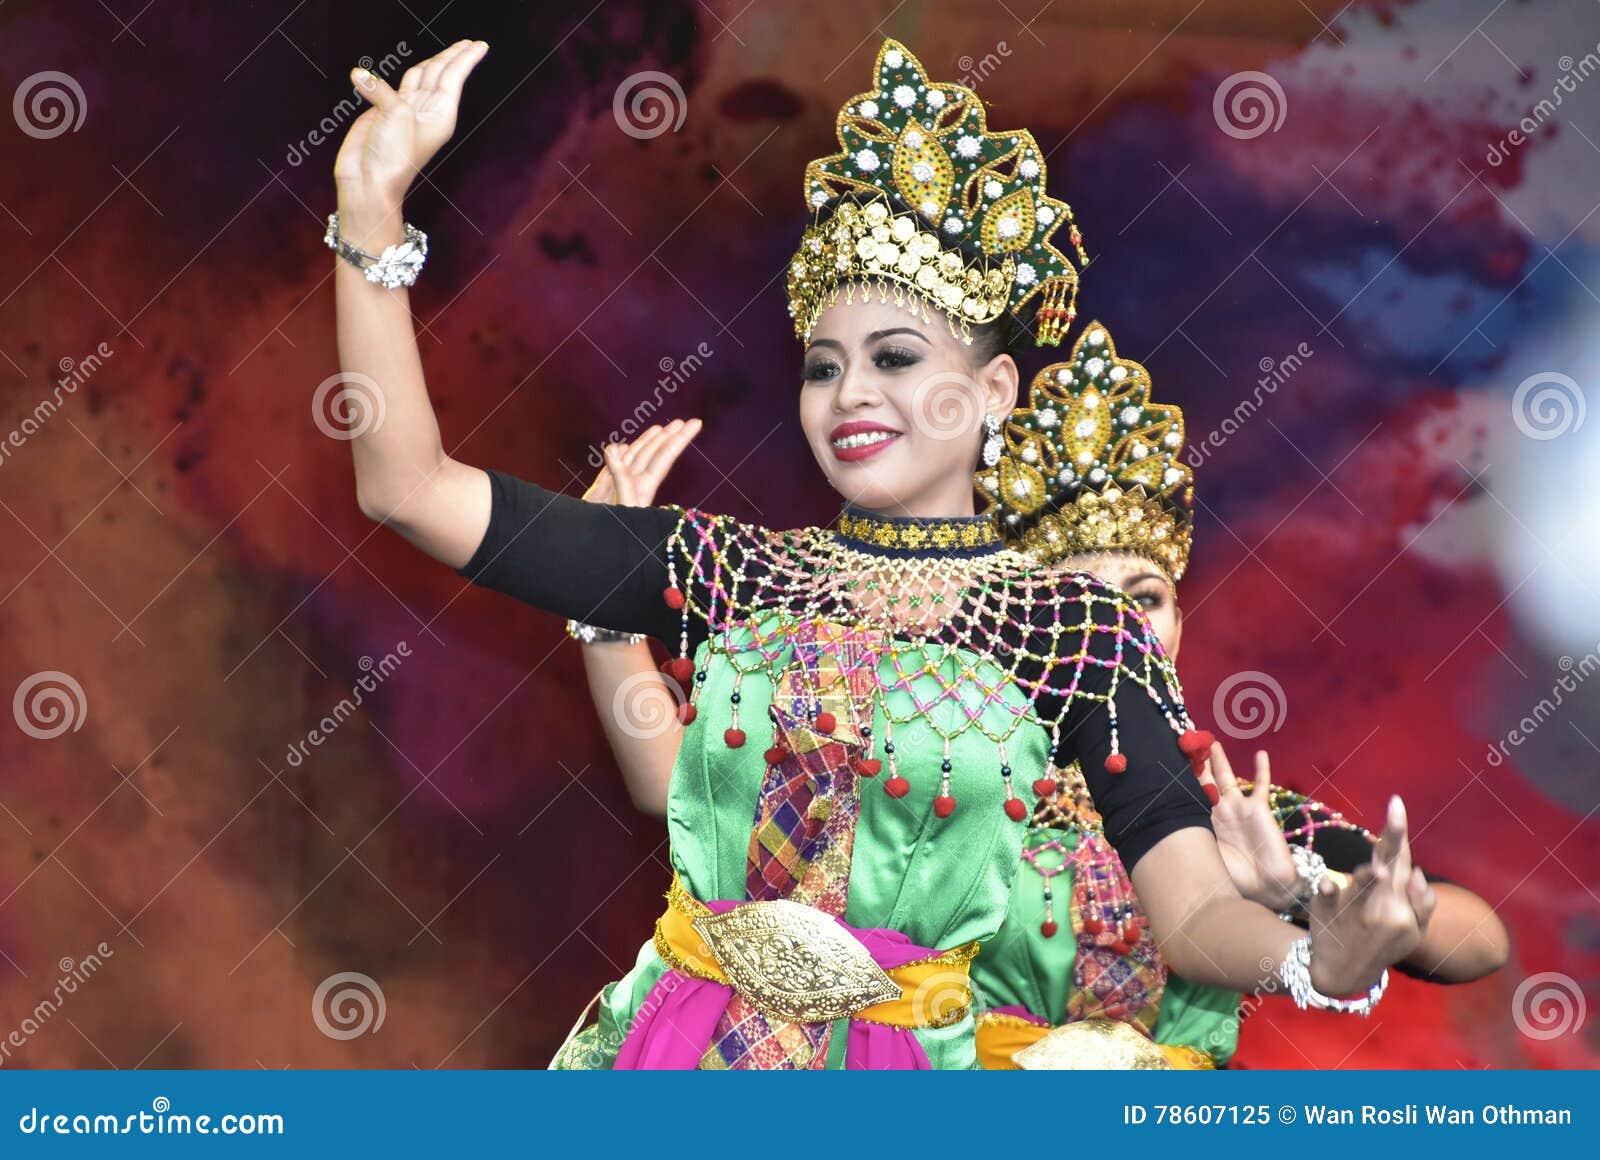 Kuda kepang dance editorial stock image. Image of malaysian 78607284.